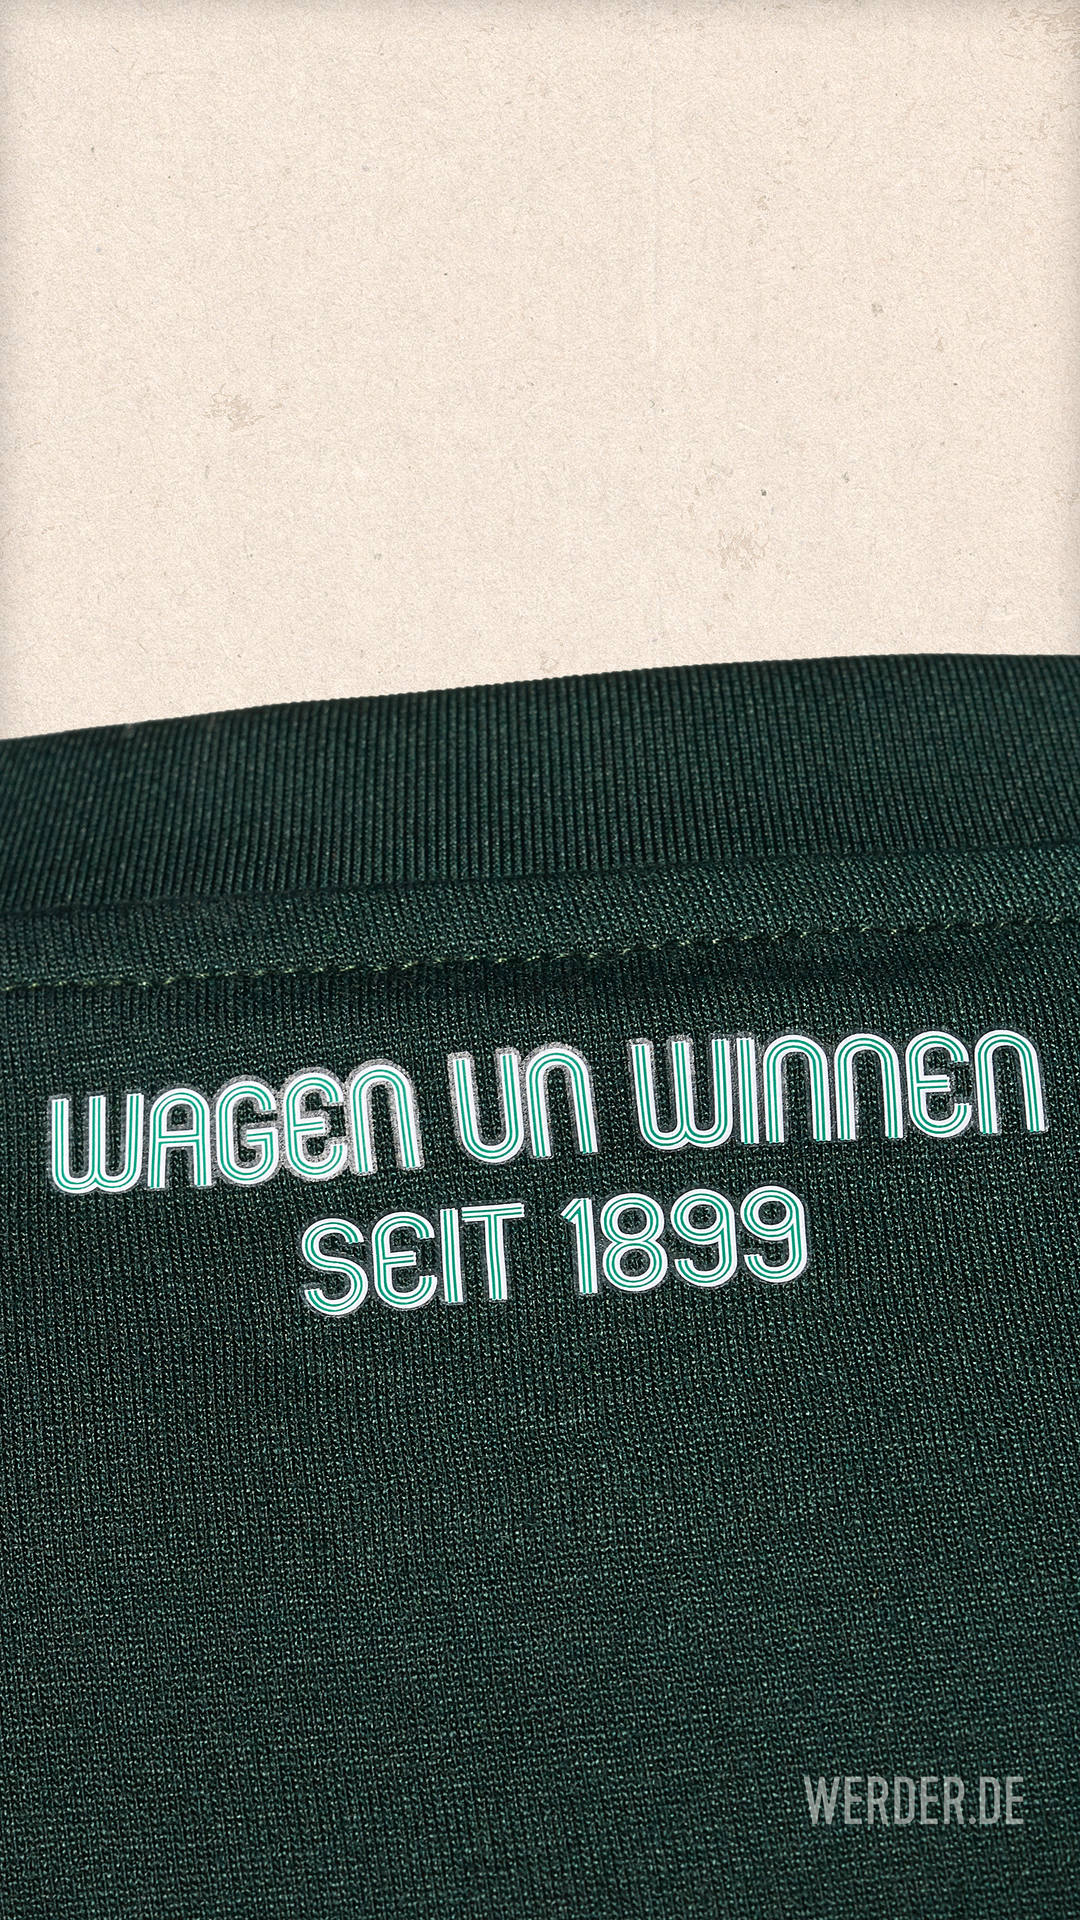 maillot-mashup-werder-breme-120-ans-4